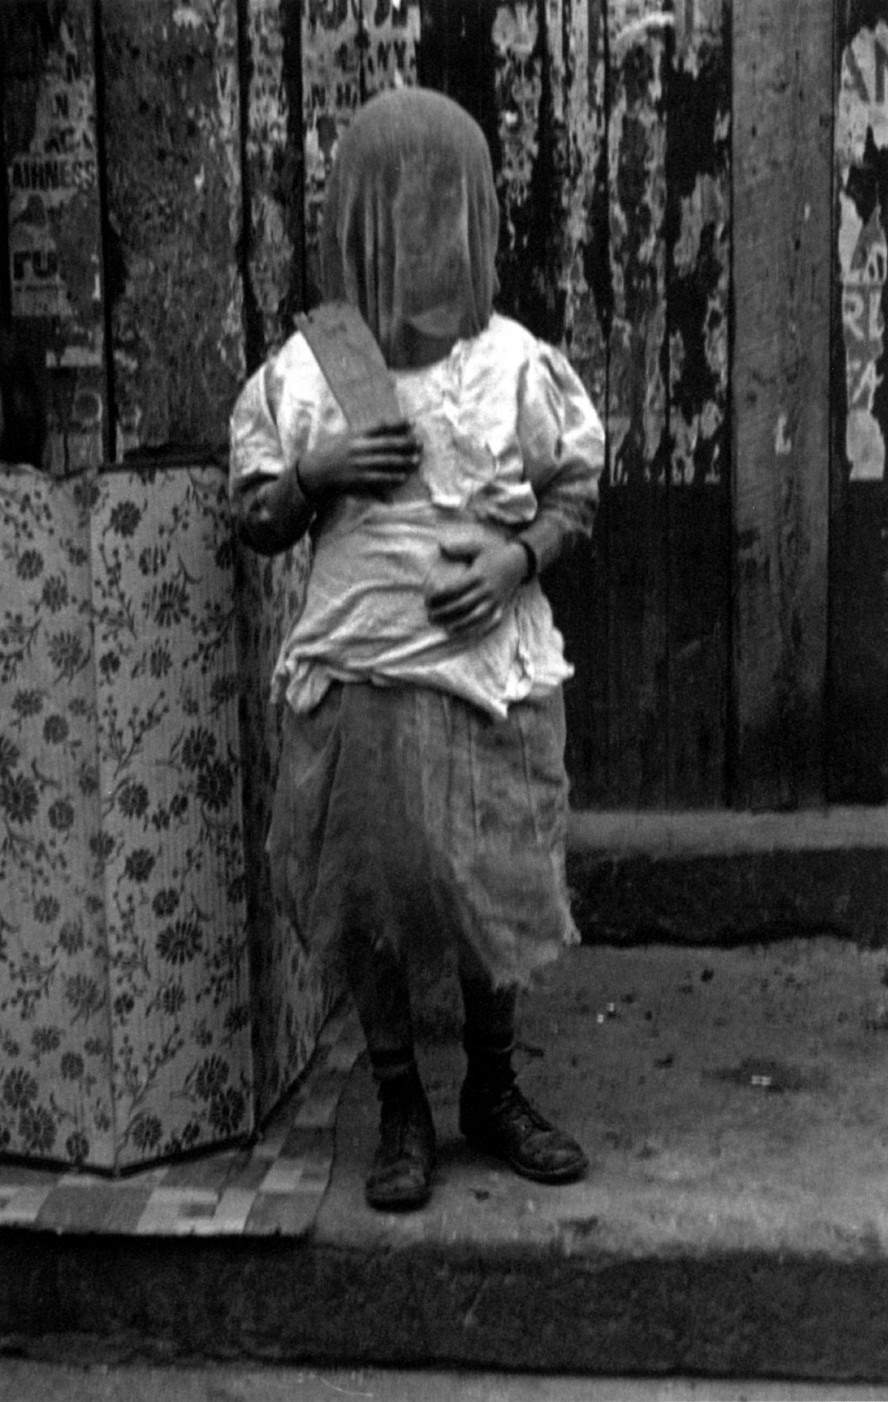 New York, (Boy with Sword), 1940